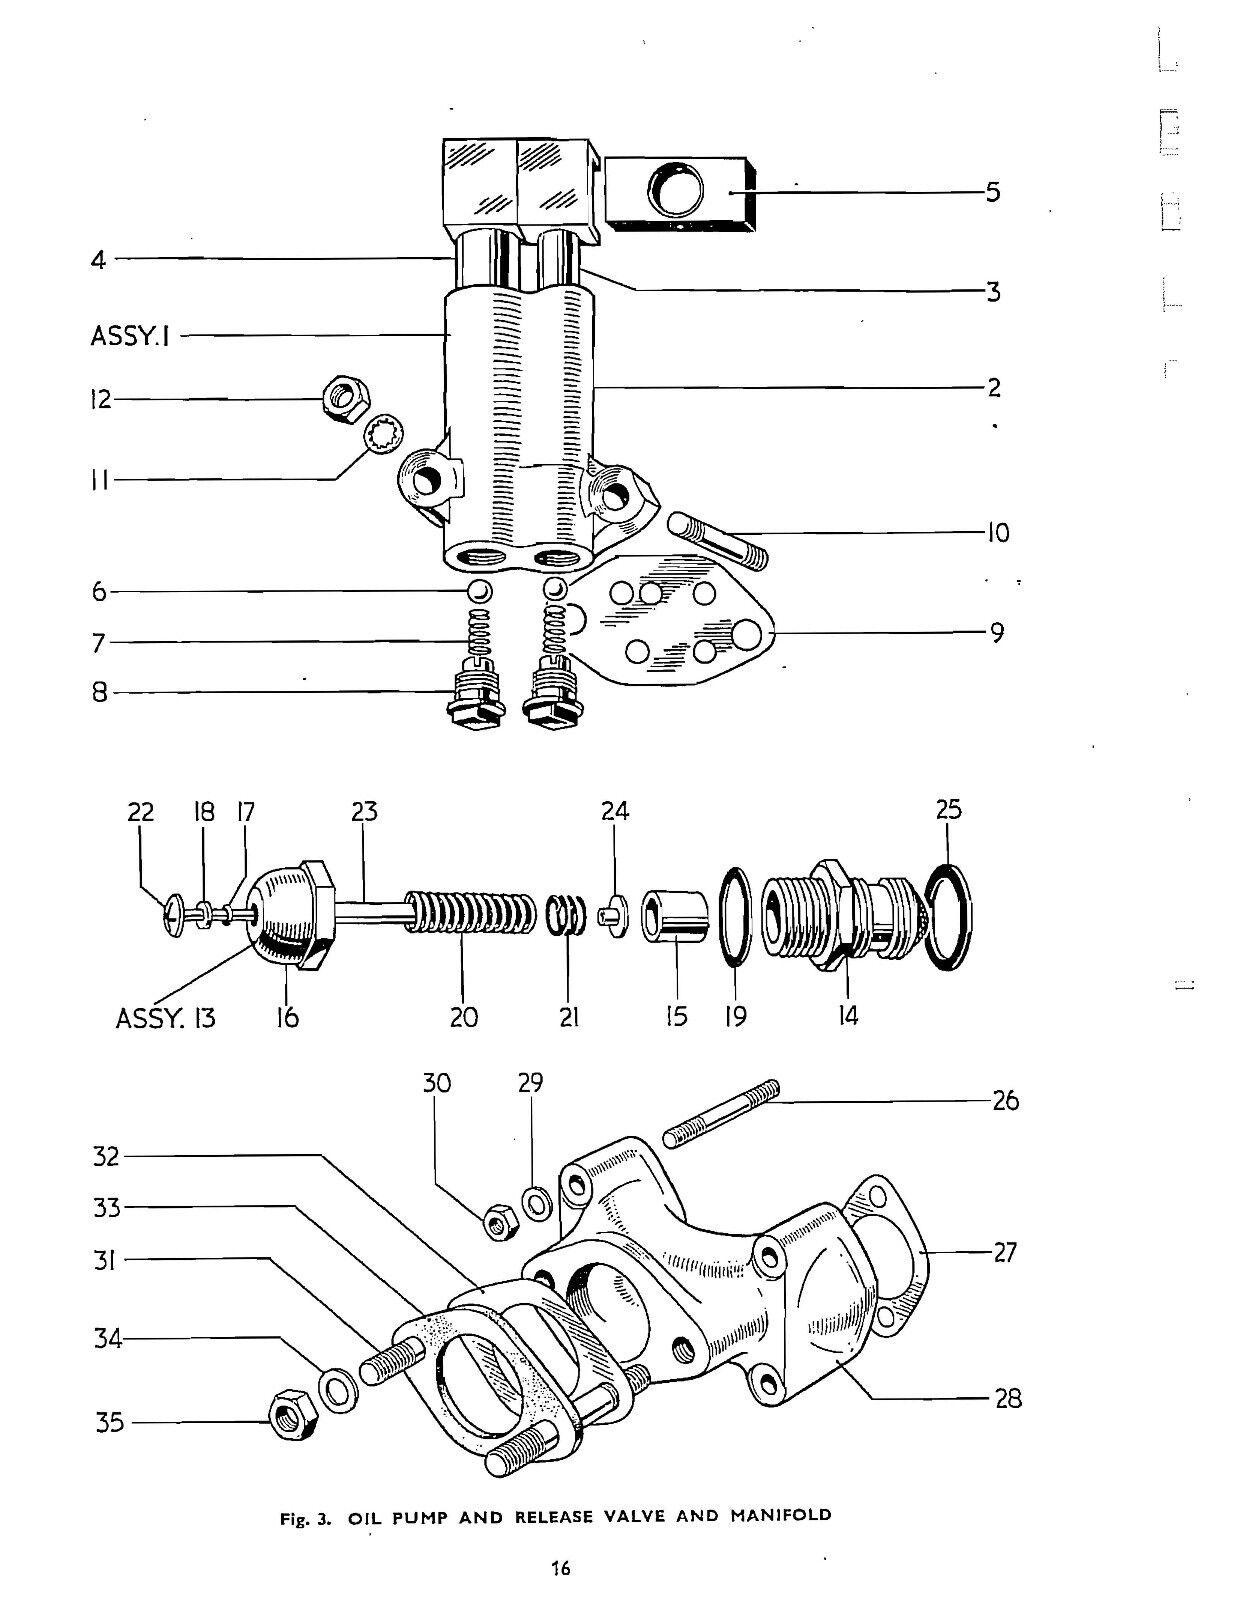 1969 triumph parts manual on